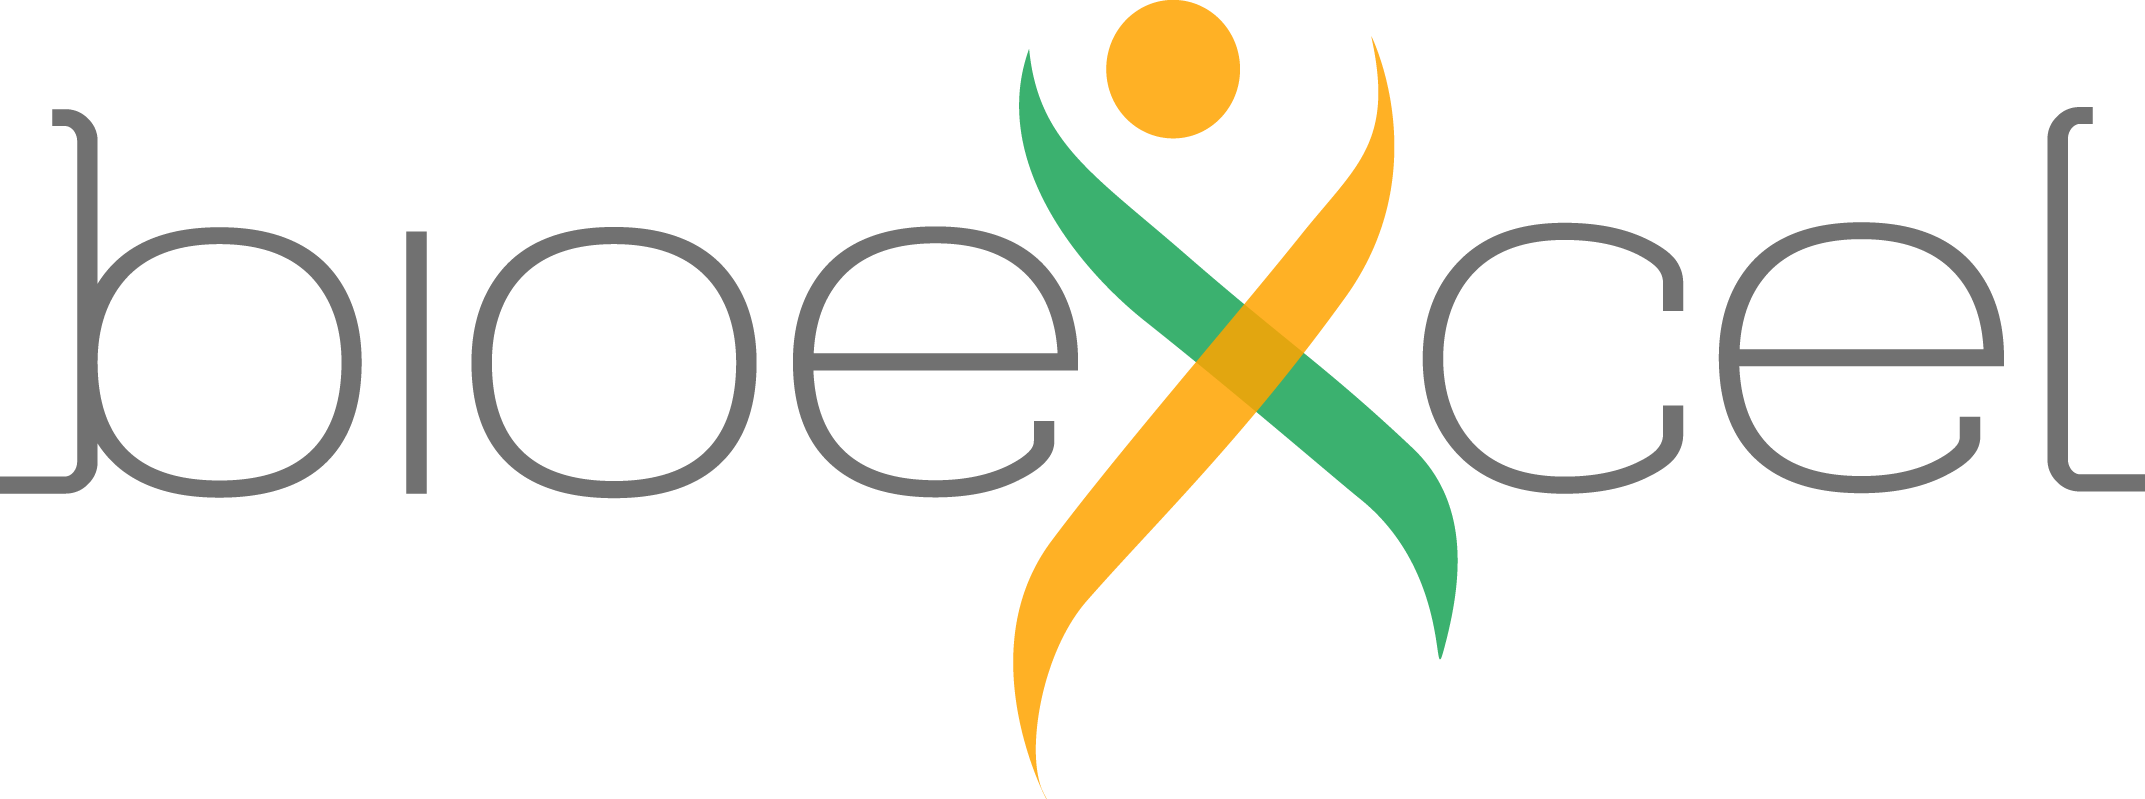 Bioexcel2 logo